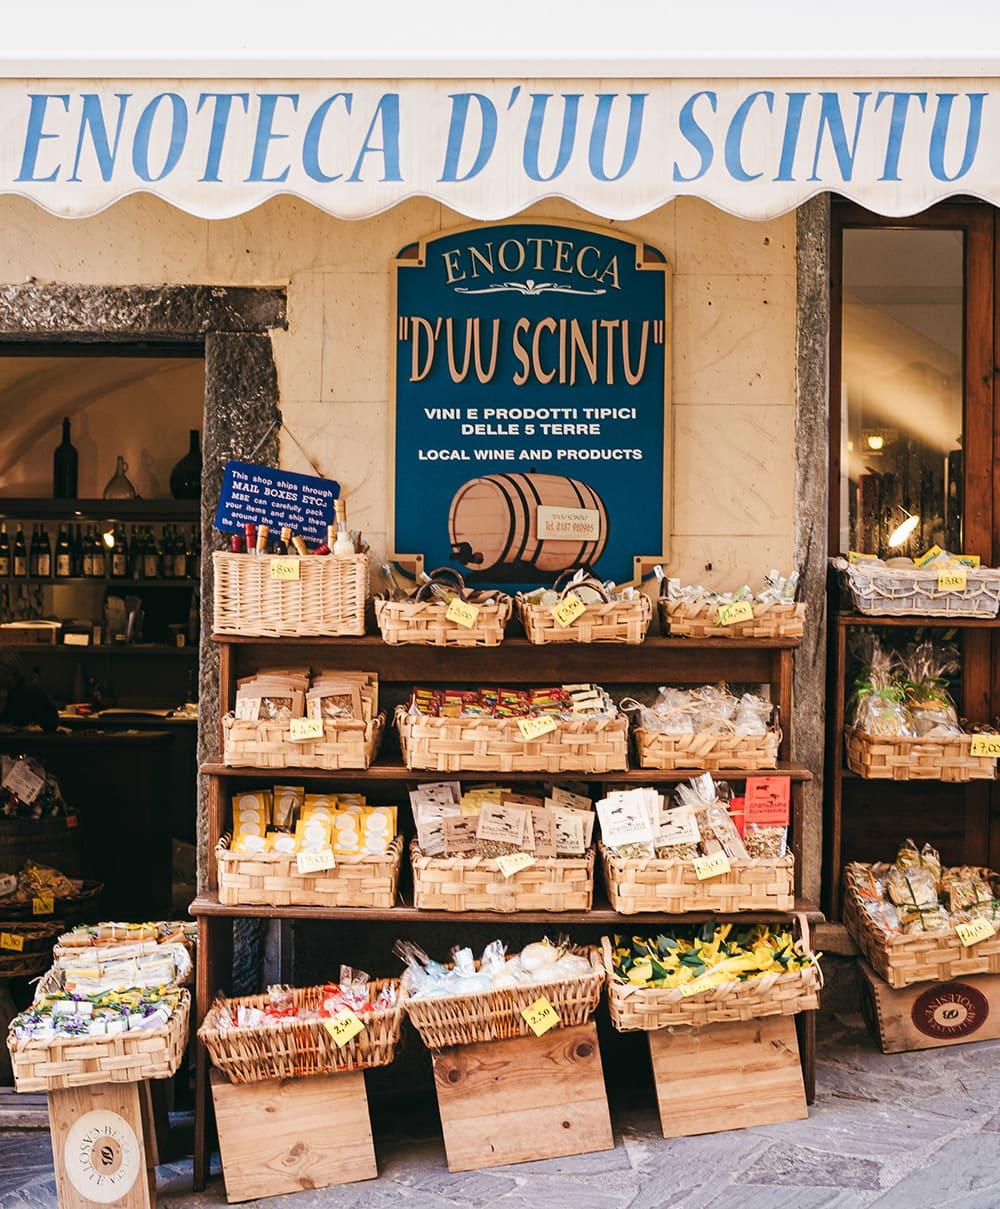 Restaurants in Cinque Terre: front view of Enoteca Du Sciuntu shop